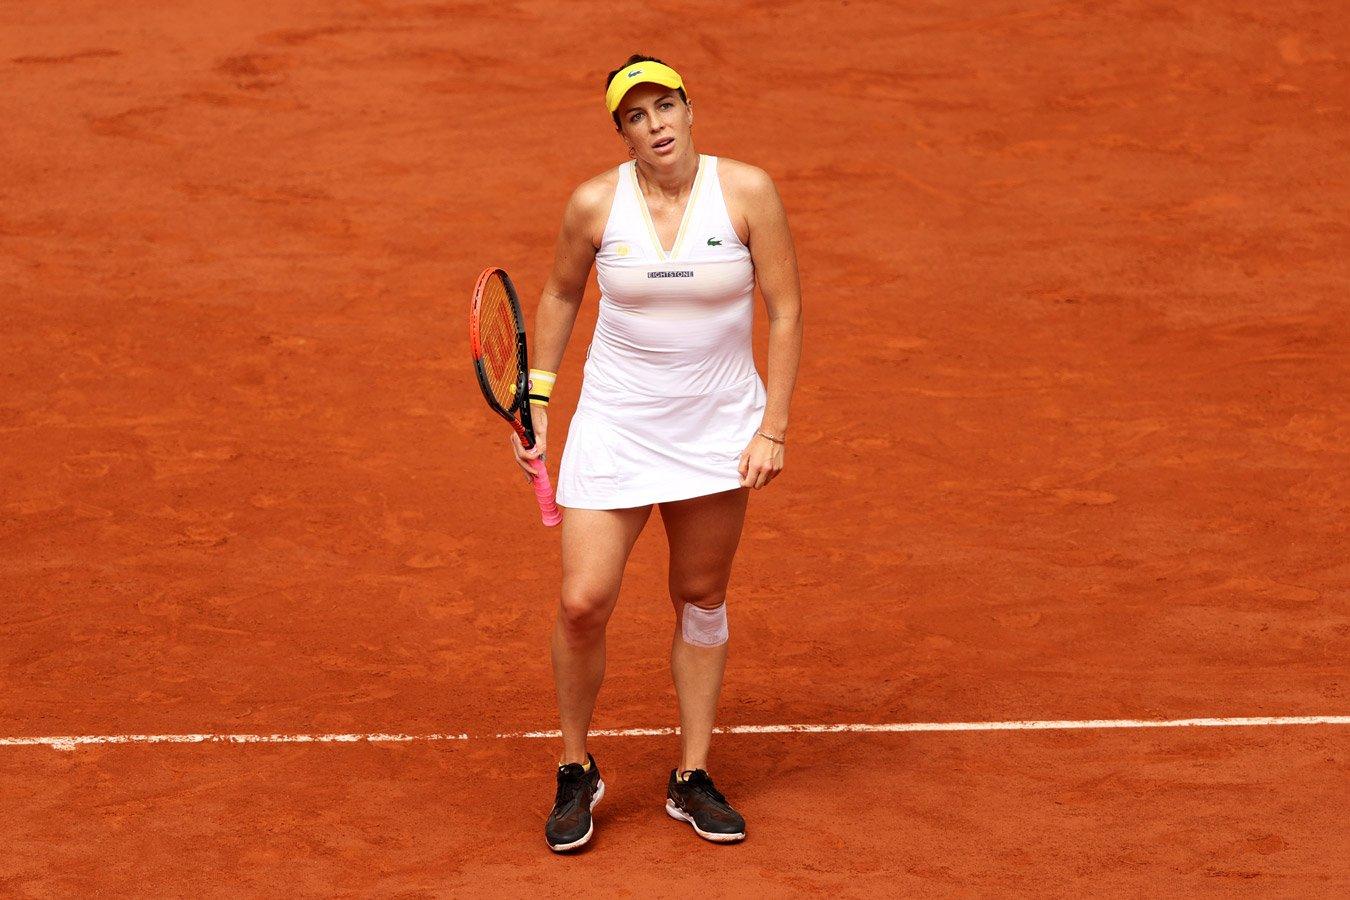 Павлюченкова не сумела завоевать титул на Ролан Гаррос, проиграв Крейчиковой в финале